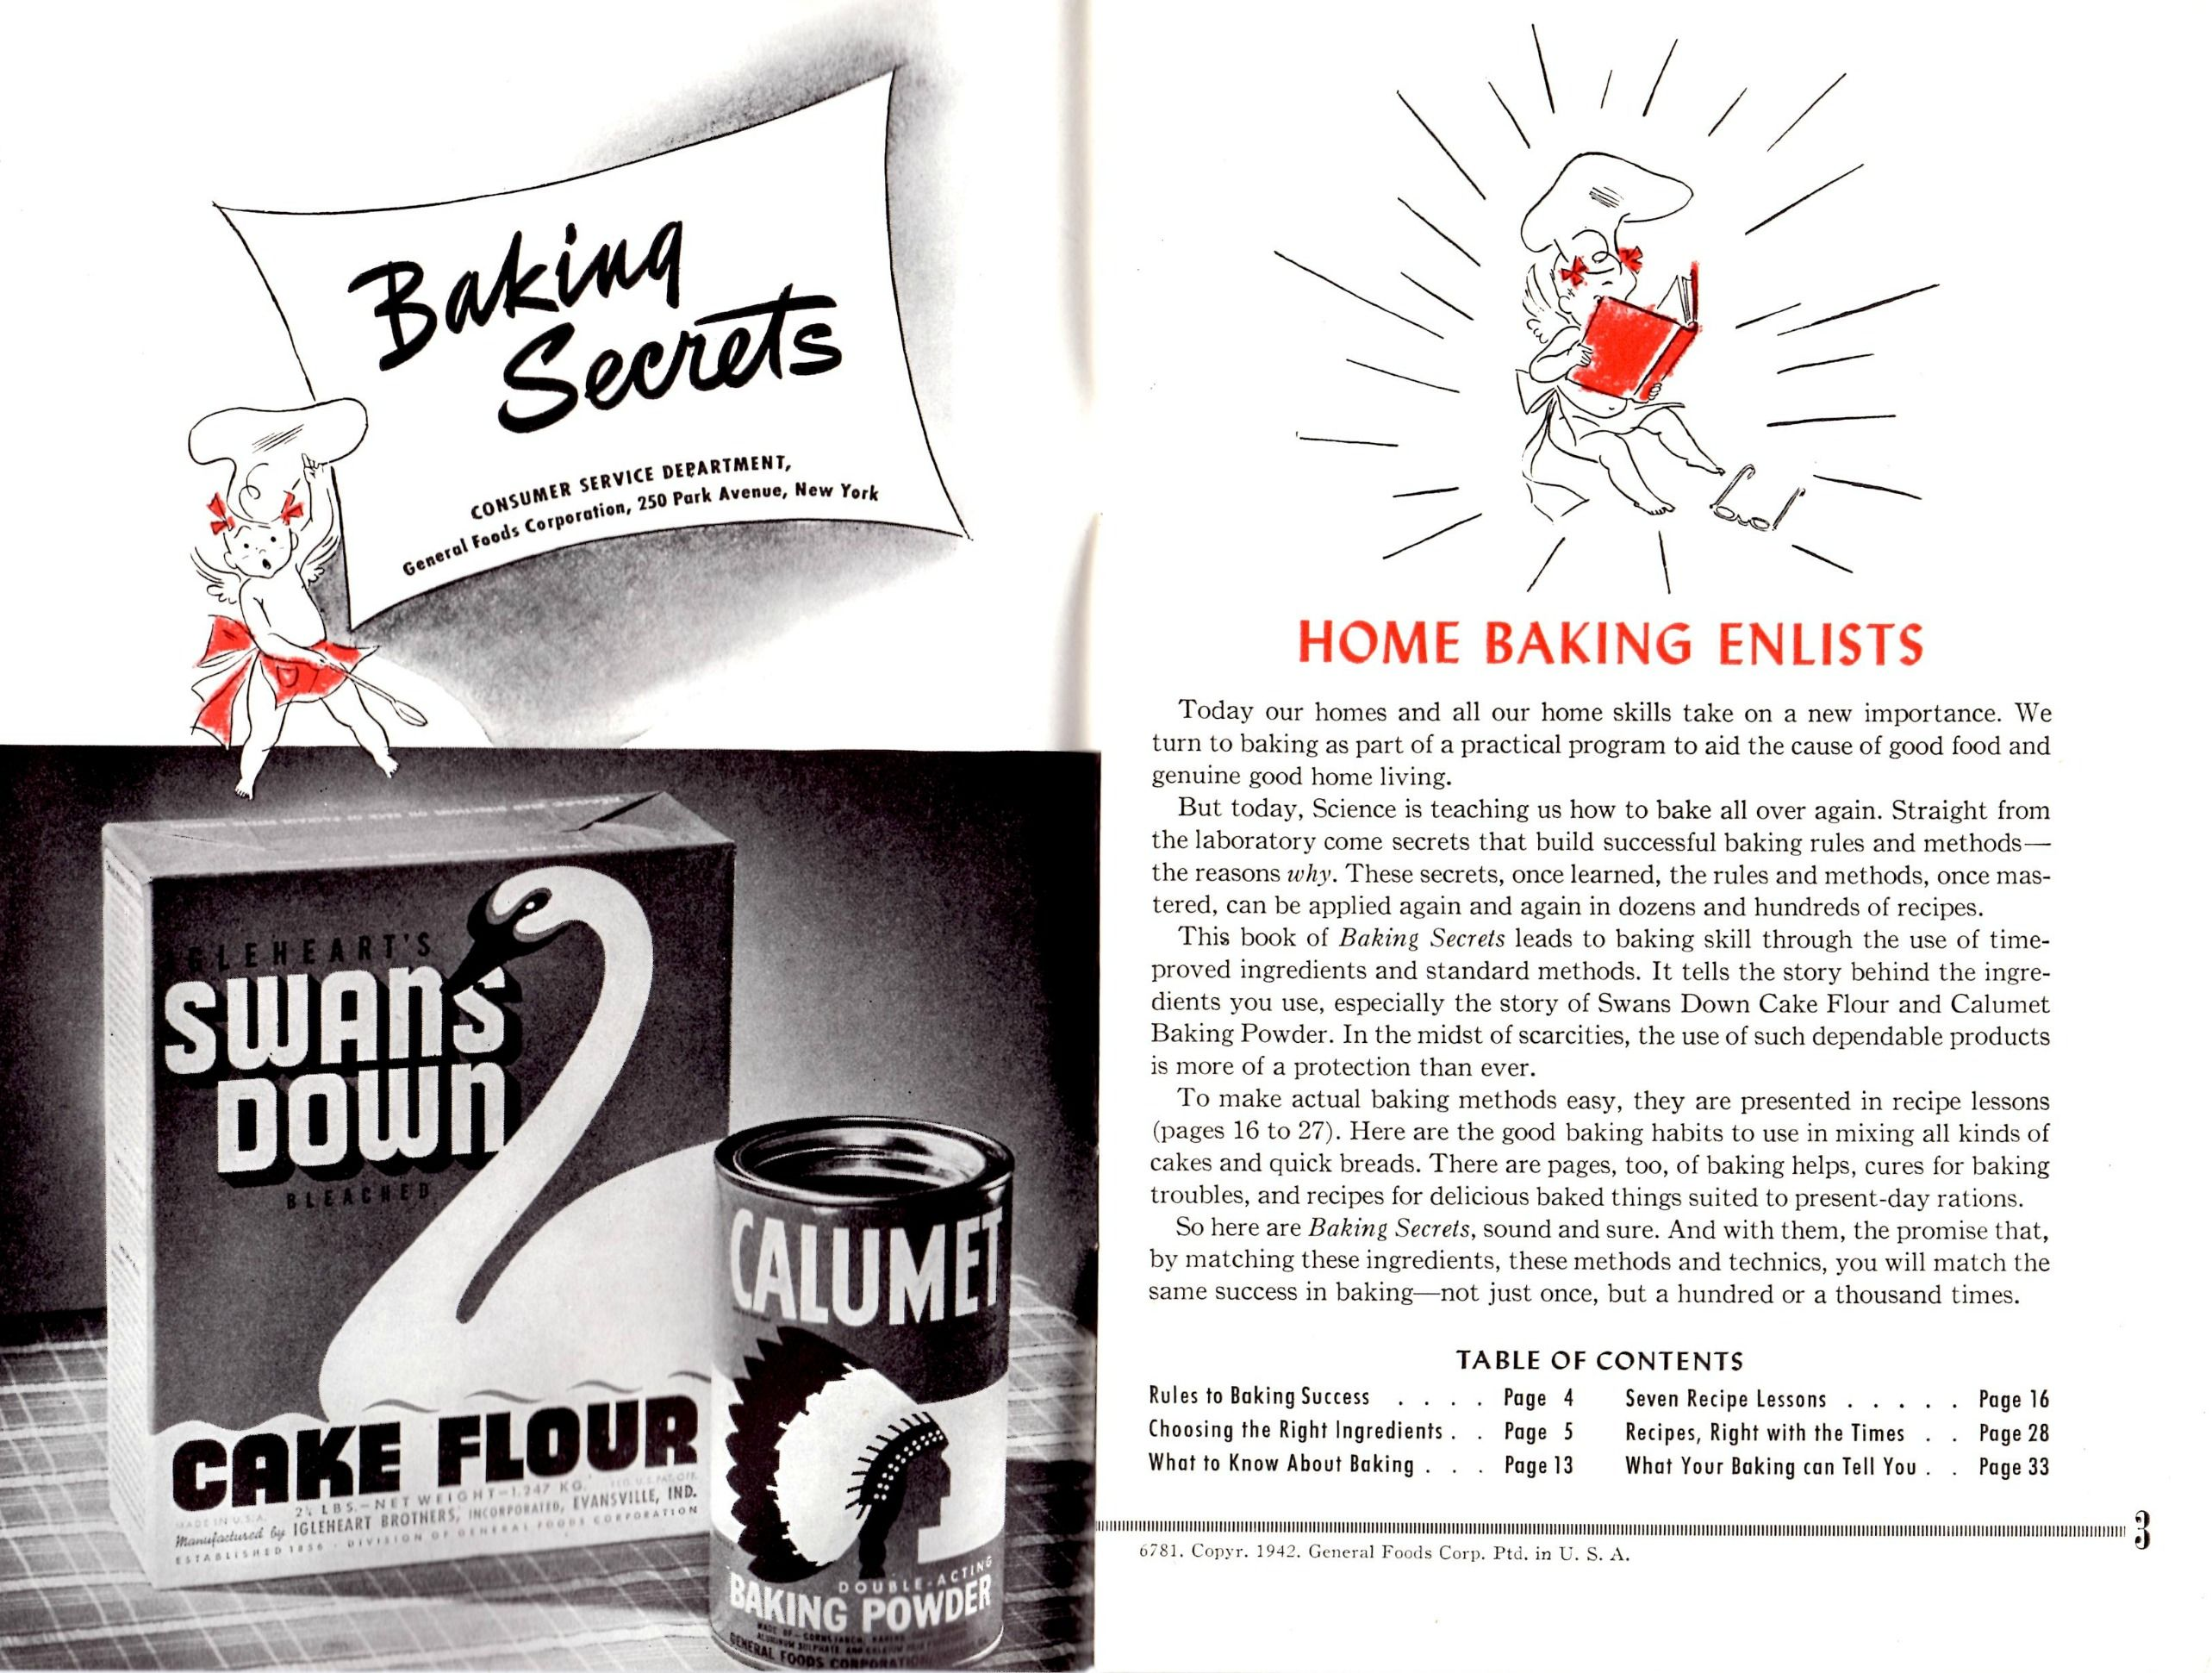 Pin by cyn zano on Vintage ephemera Baking secrets, Home